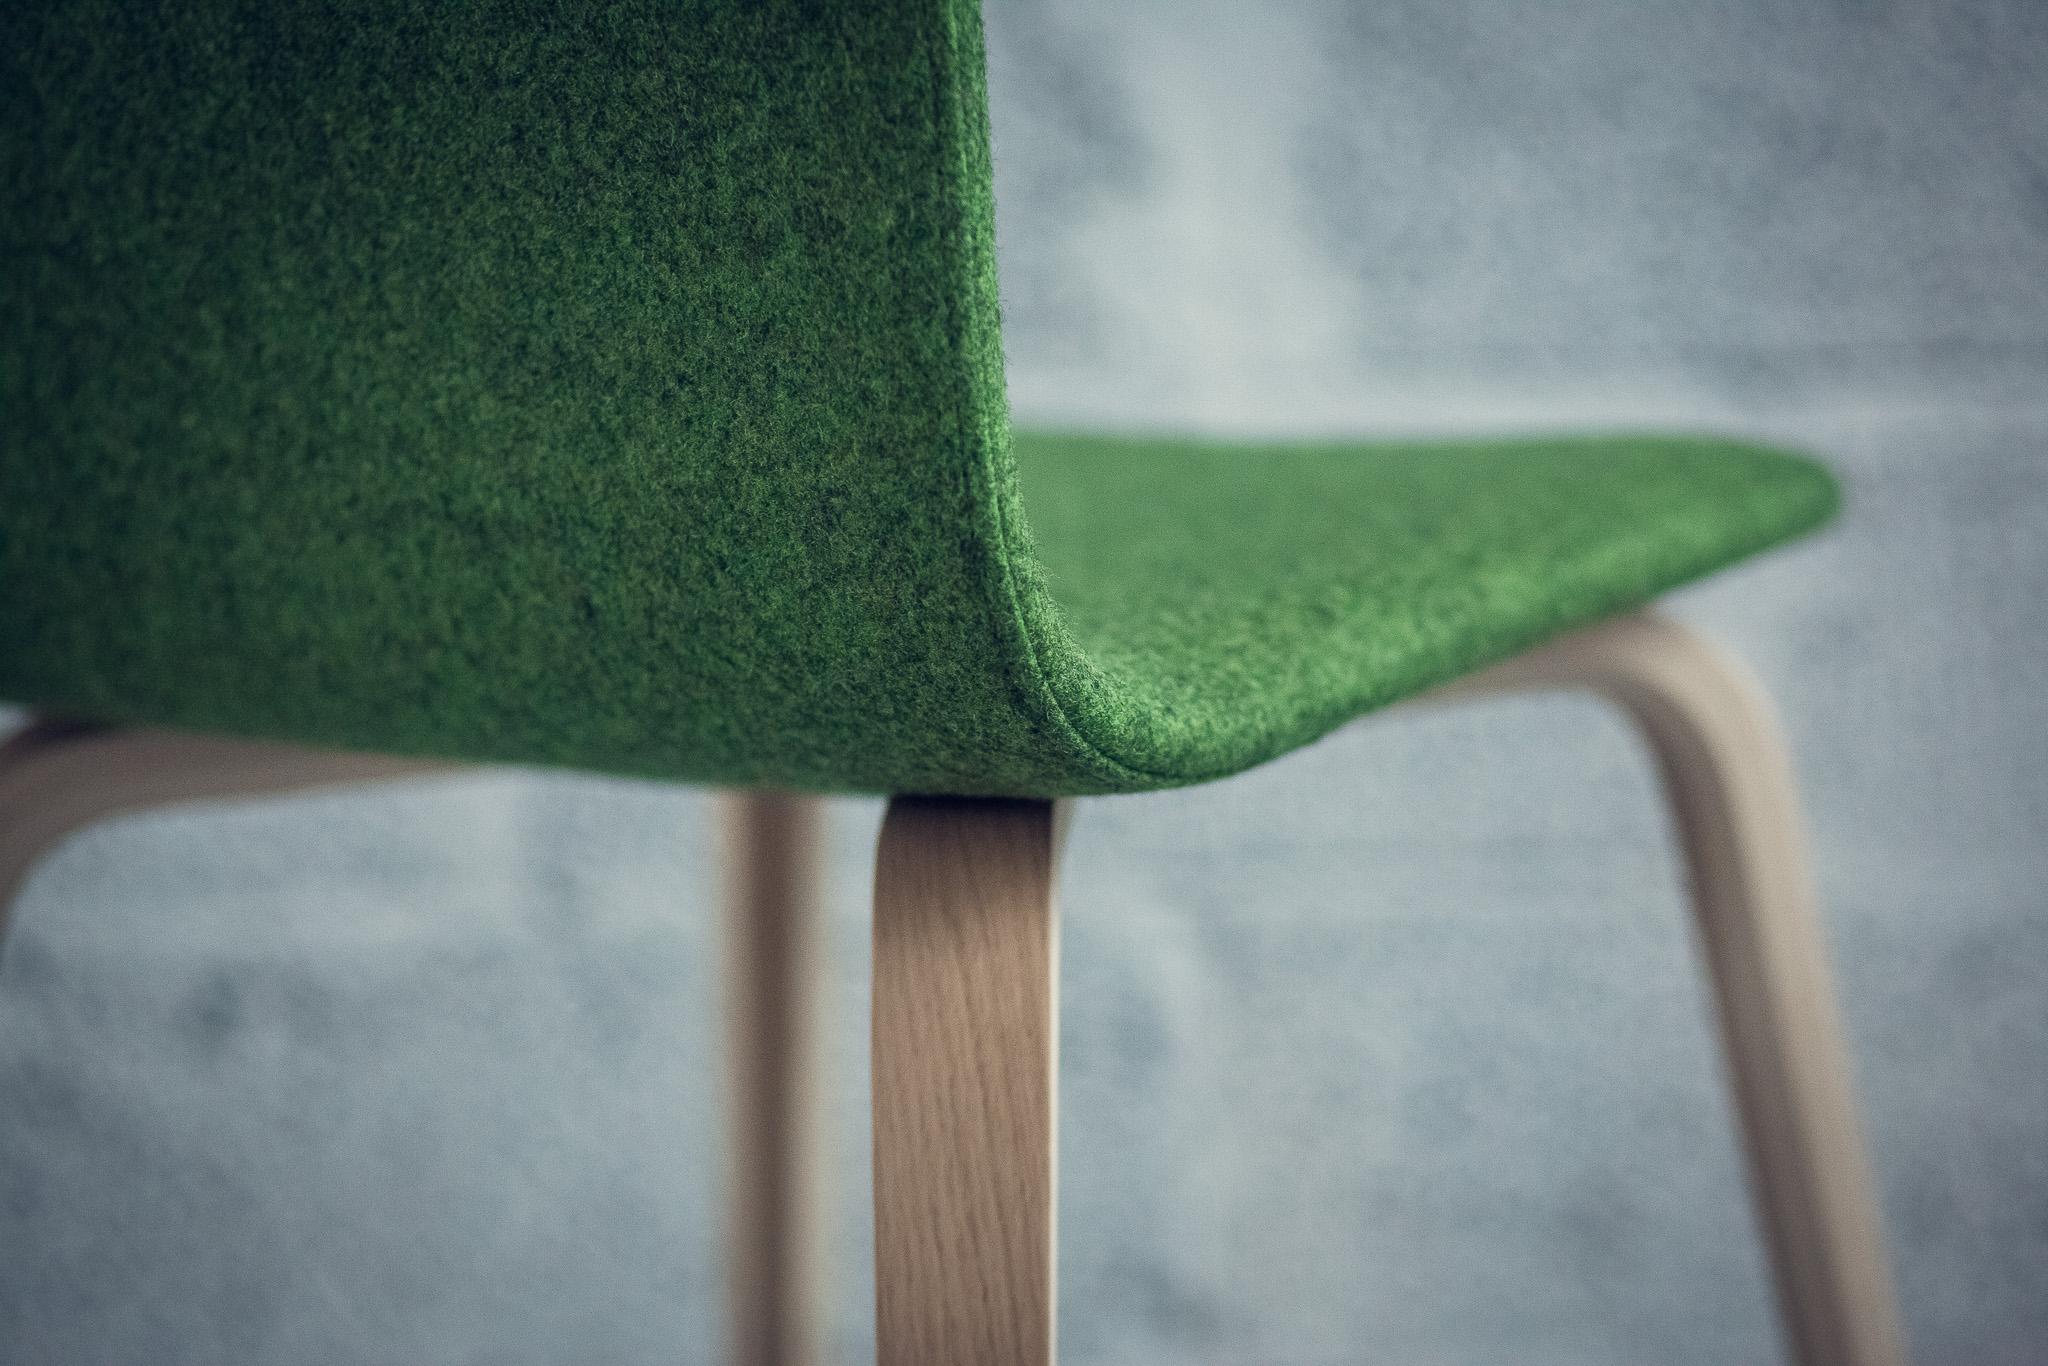 Dižozols bent wood design chairs (2)